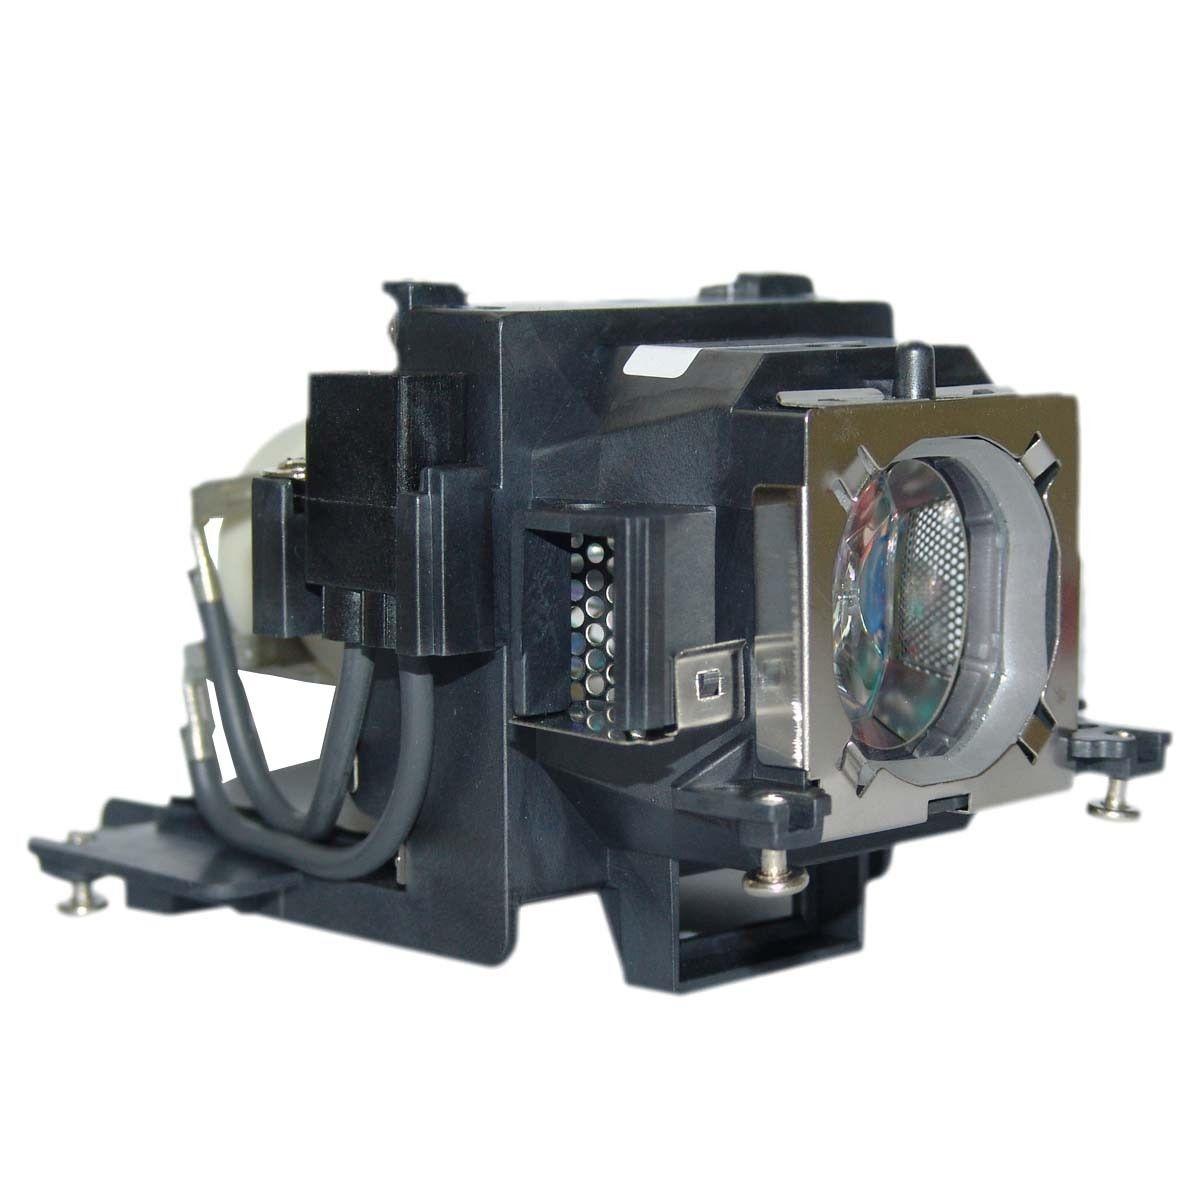 ET-LAV100 For Panasonic PT-VX400E PT-VX400EA PT-VW330 PT-VW330U PT-VX400NTE PT-VX410 PT-VX400U PT-VX41 Projector Lamp Bulb projector lamp original bare blub lav100 for panasonic pt vw330 pt vx400 pt vx41